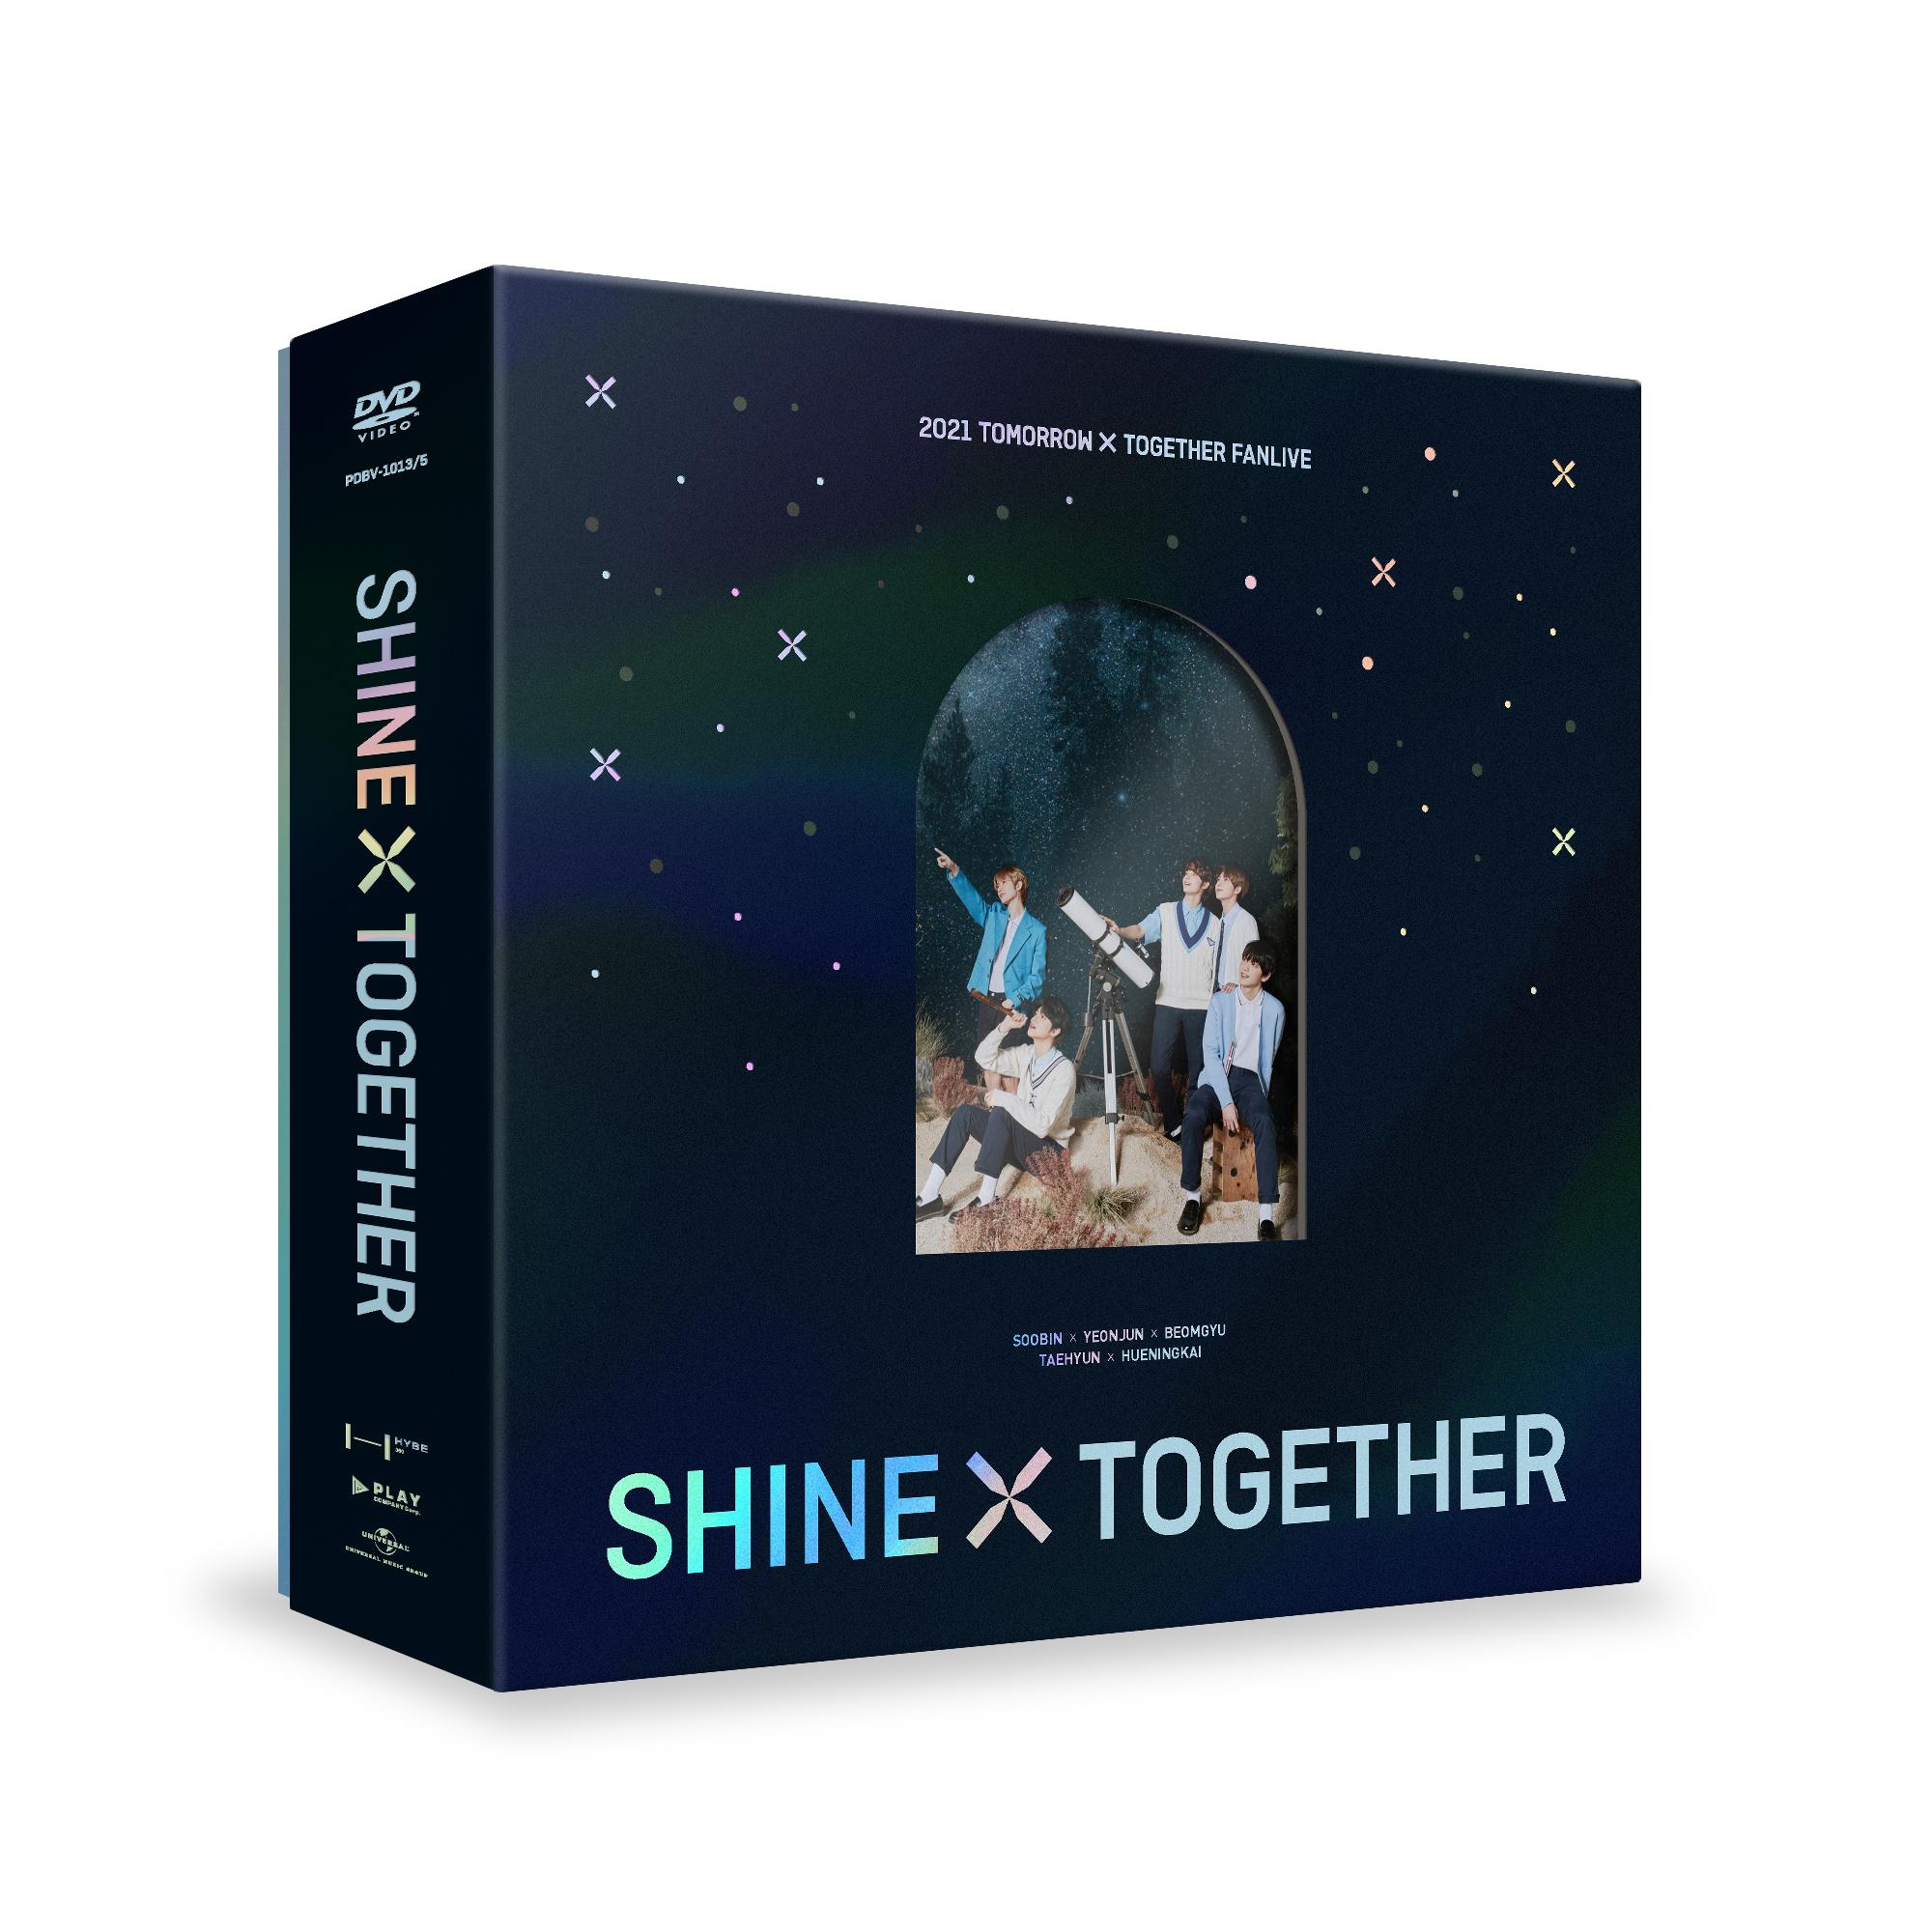 JP_TXT_SHINE_X_TOGETHER_DVD_cover_revised